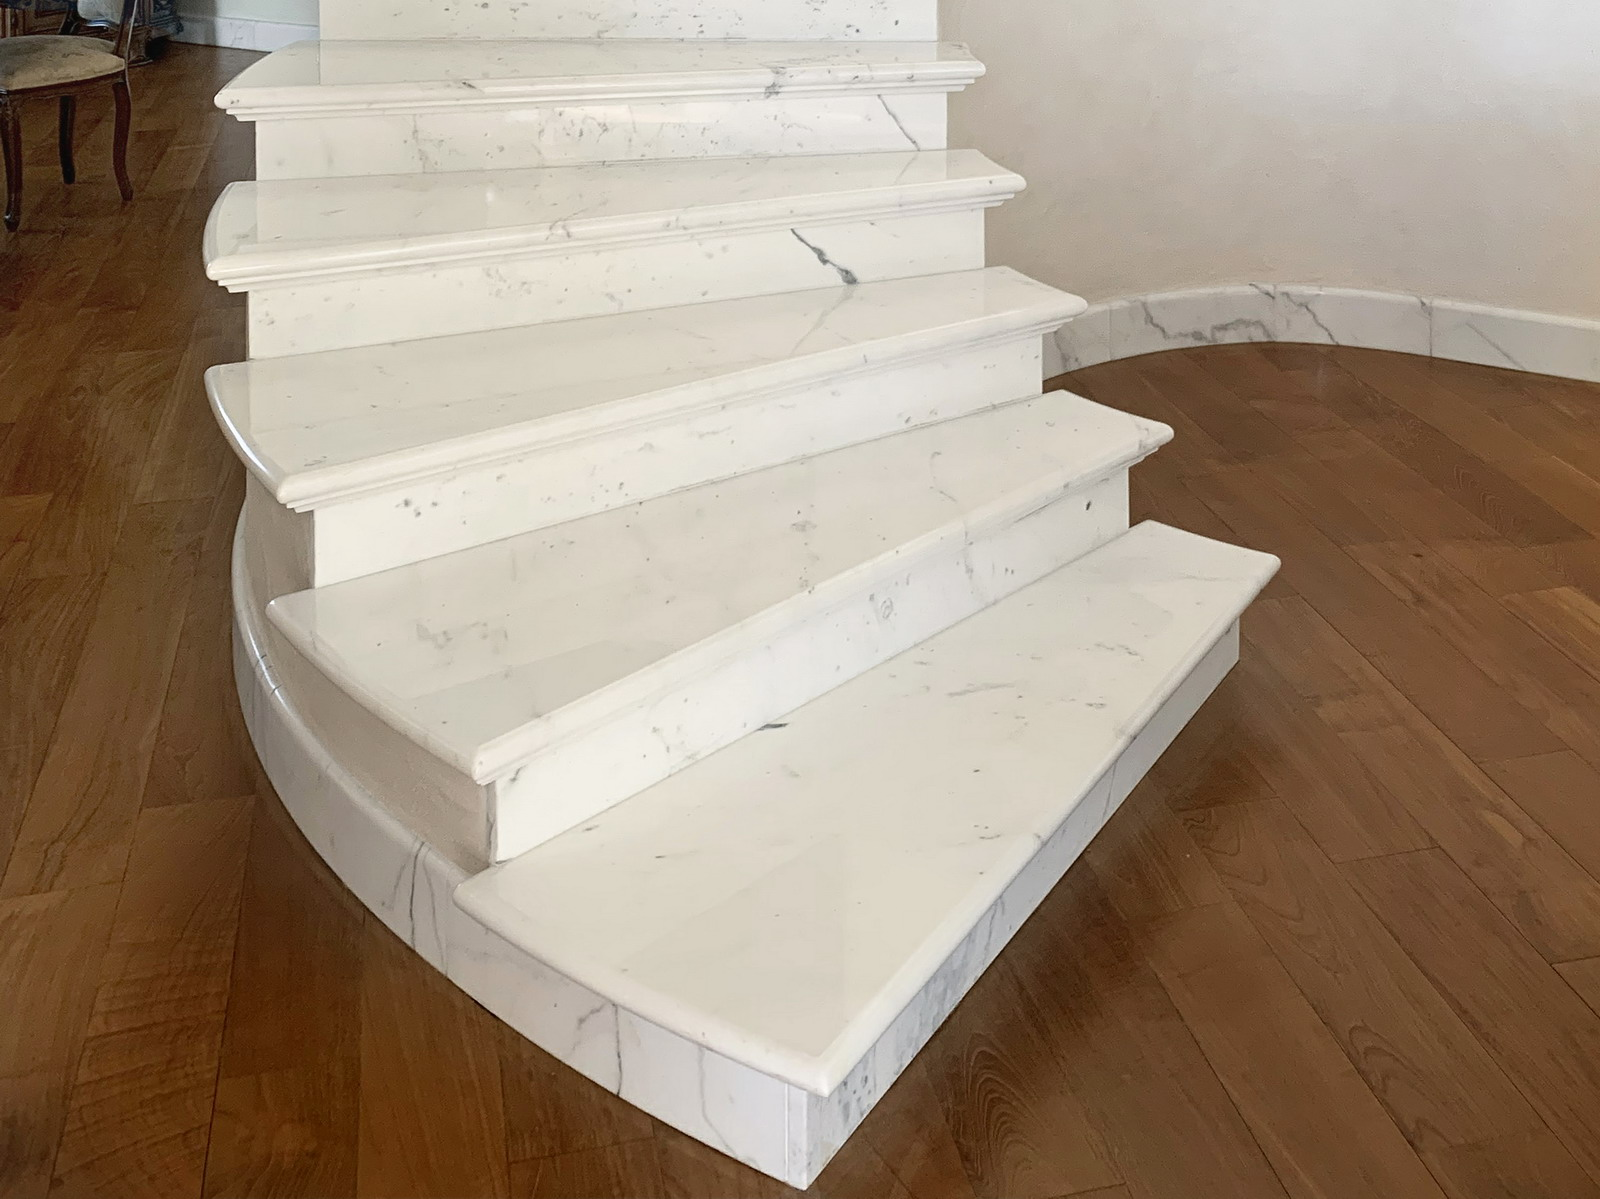 MEDONE MARMI Scala e Balaustra in Marmo Bianco Carrara - 4